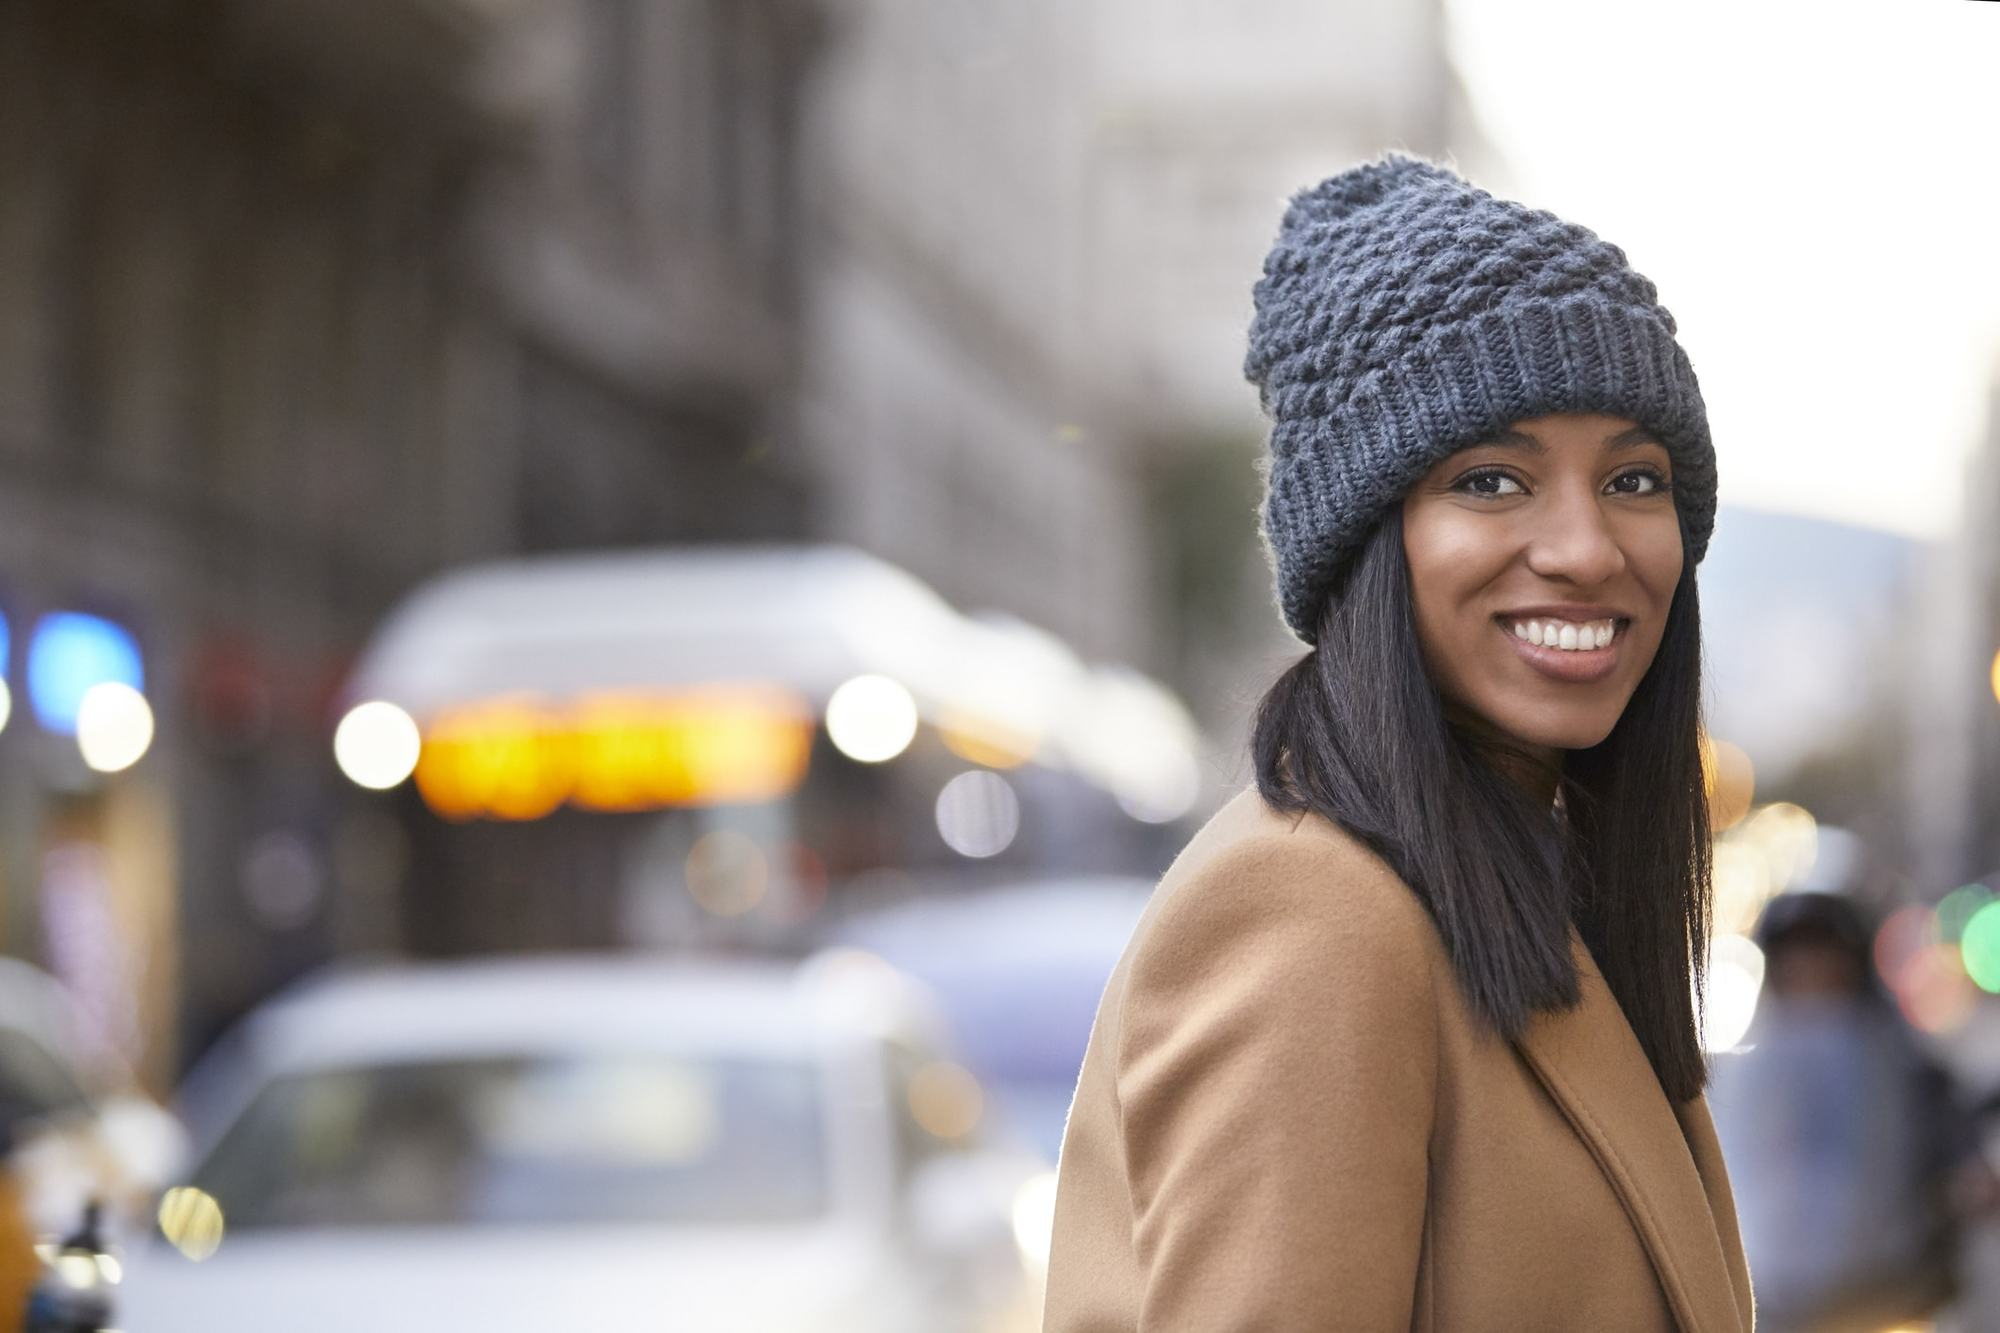 winter hair trends straight hair hat